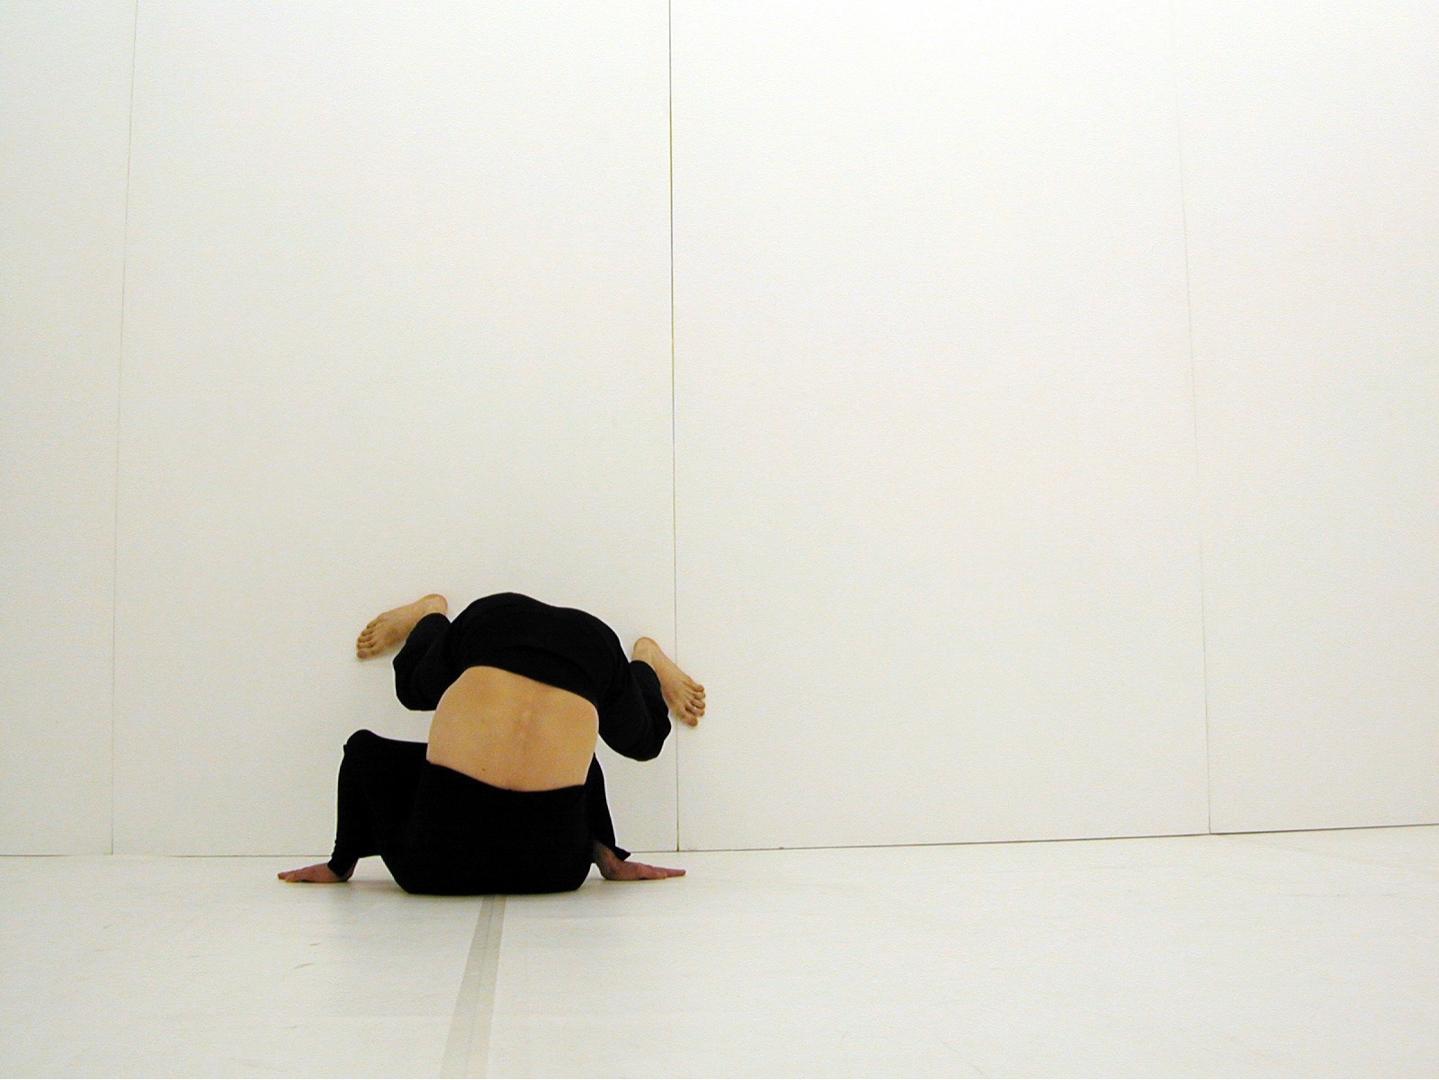 Xavier Le Roy (French, born 1963) image